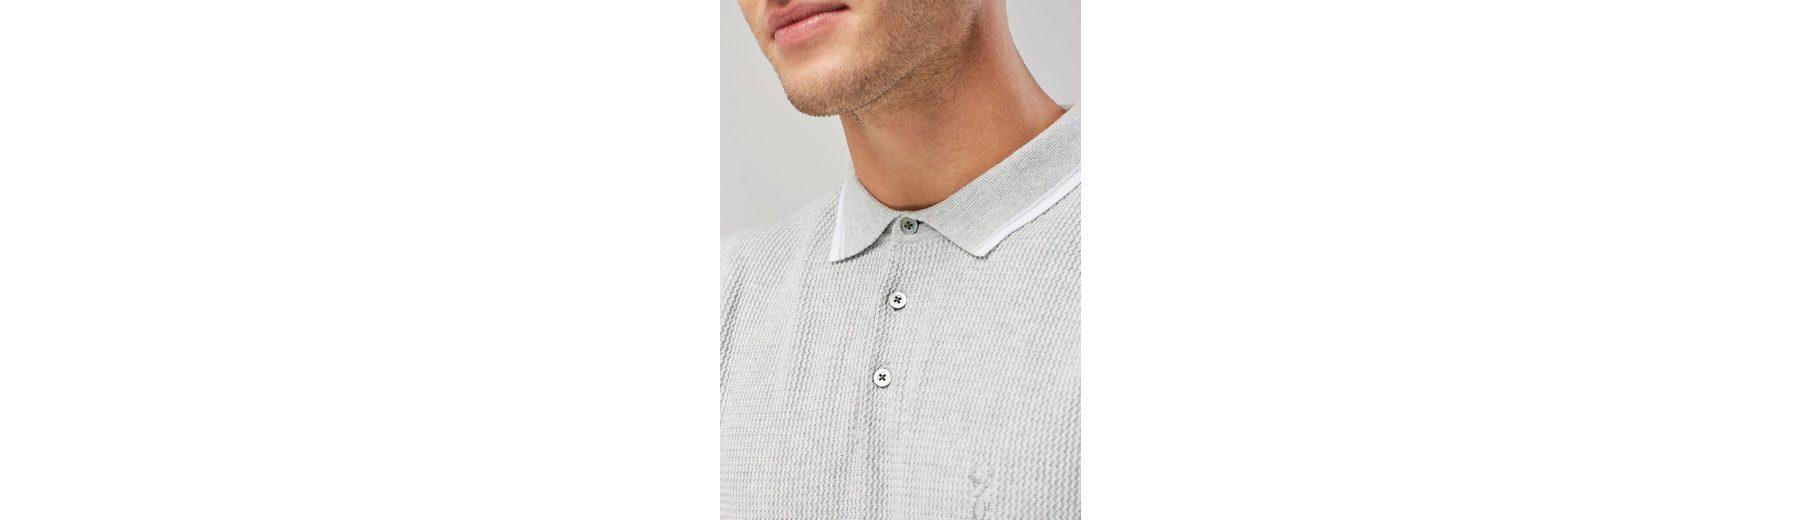 Poloshirt mit Poloshirt mit Kantendetails Poloshirt Kantendetails Next Strukturiertes mit Kantendetails Next Next mit Strukturiertes Strukturiertes Next Strukturiertes Poloshirt 0ZXRqAxw